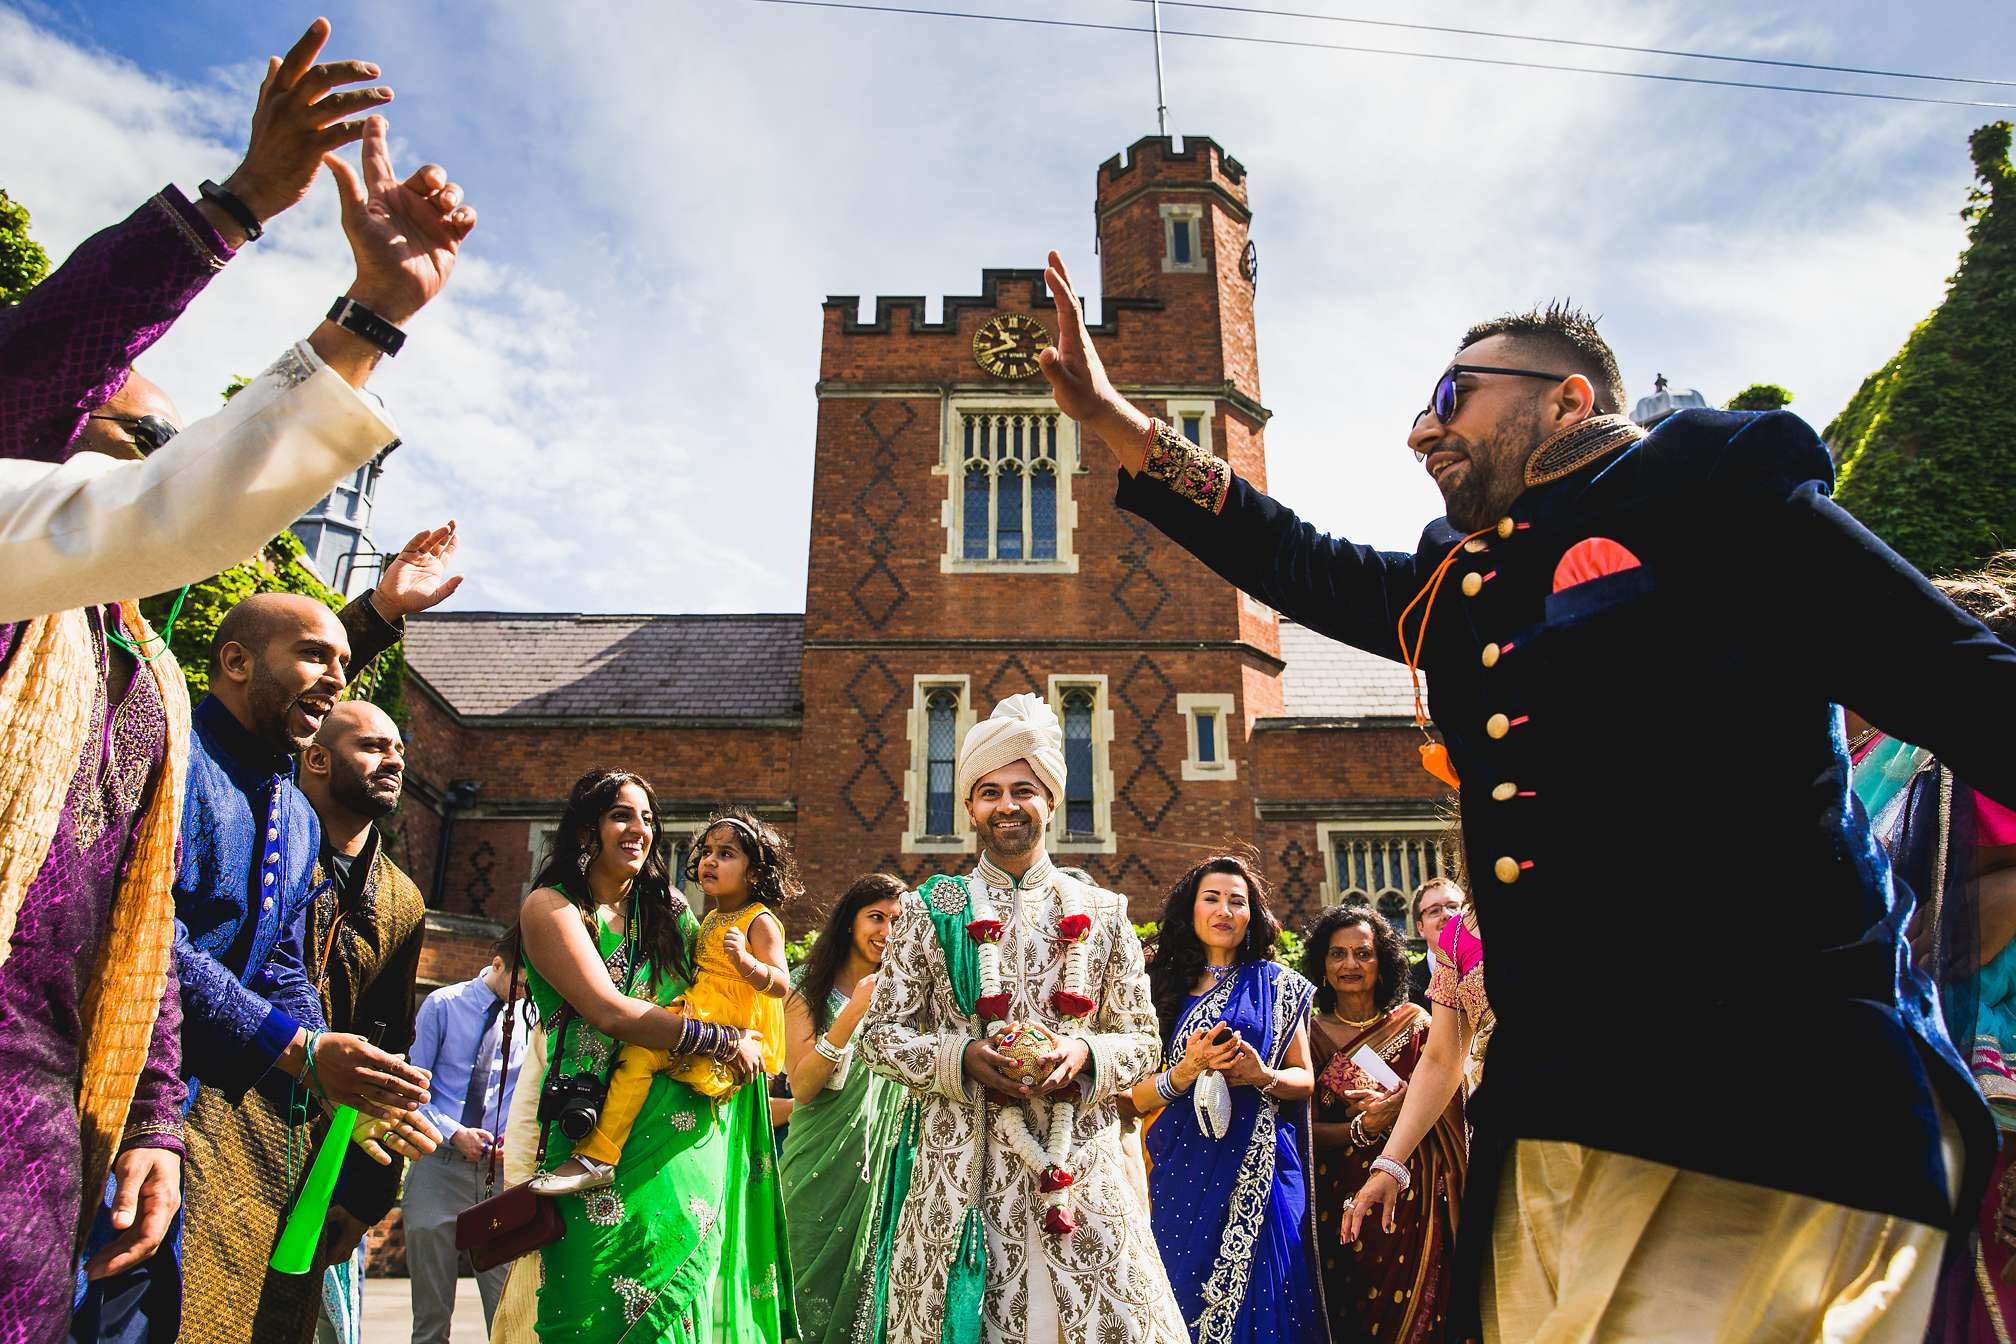 Fun Hindu baraat dancing